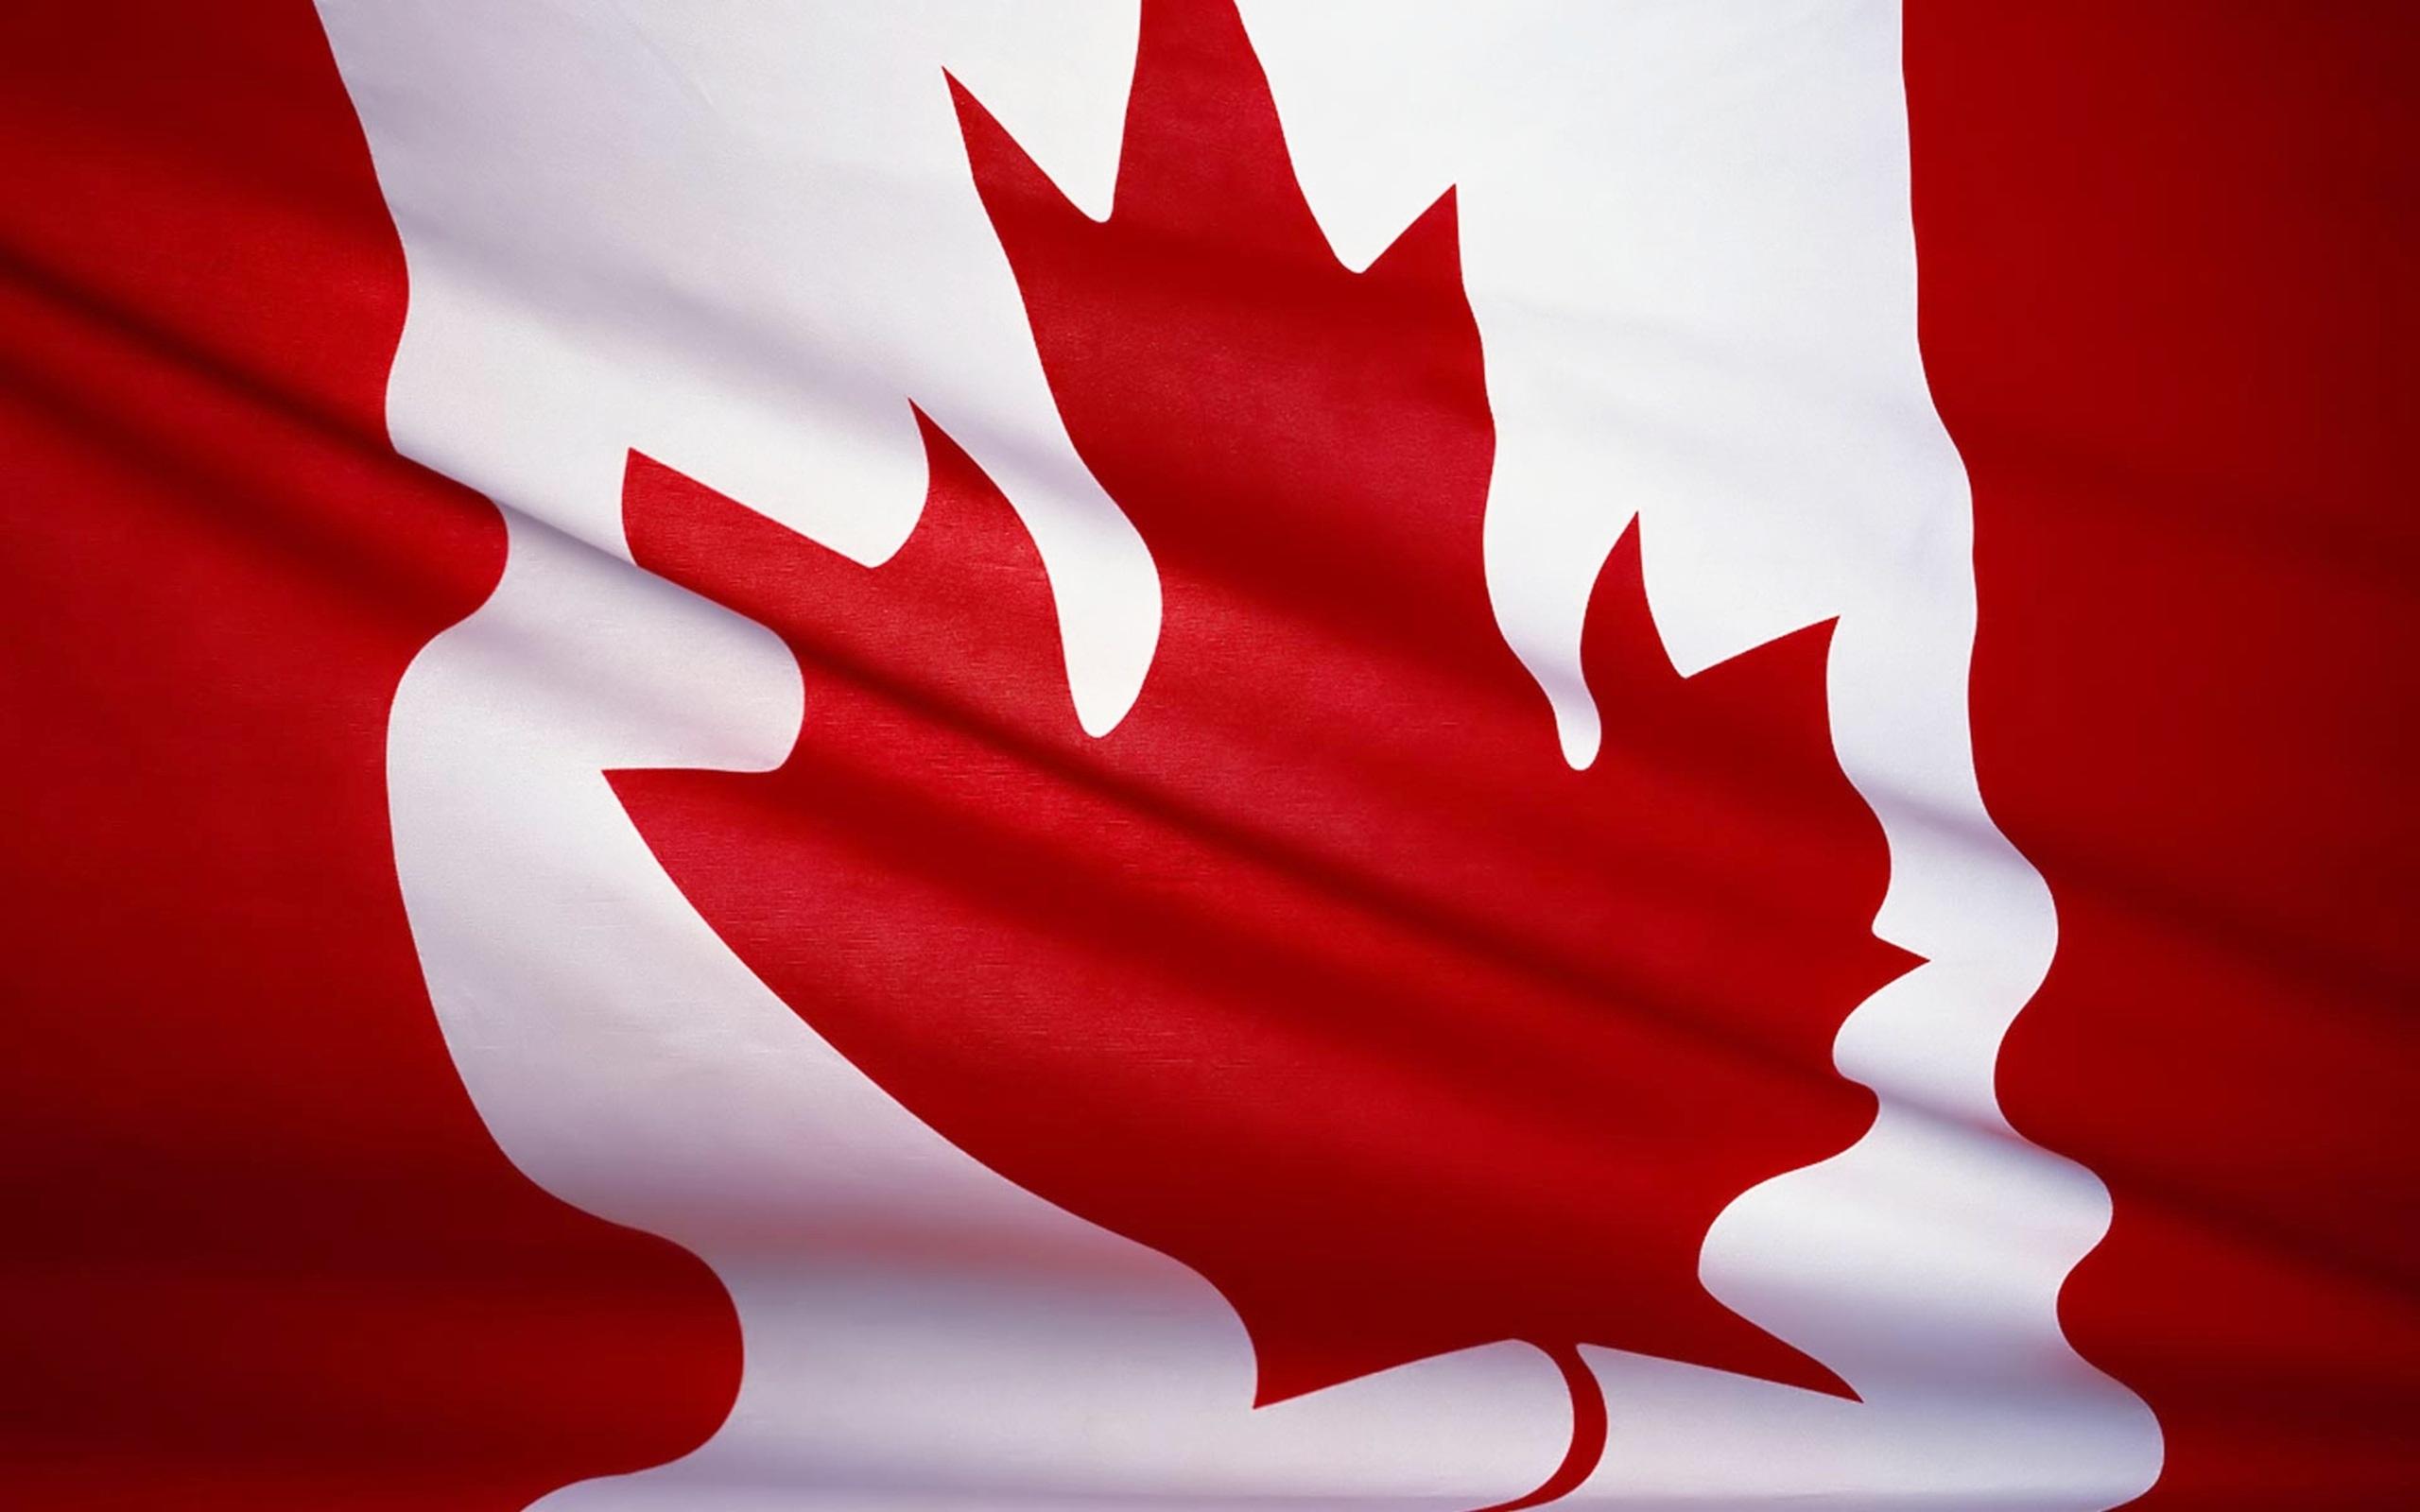 Canada National Flag wallpaper